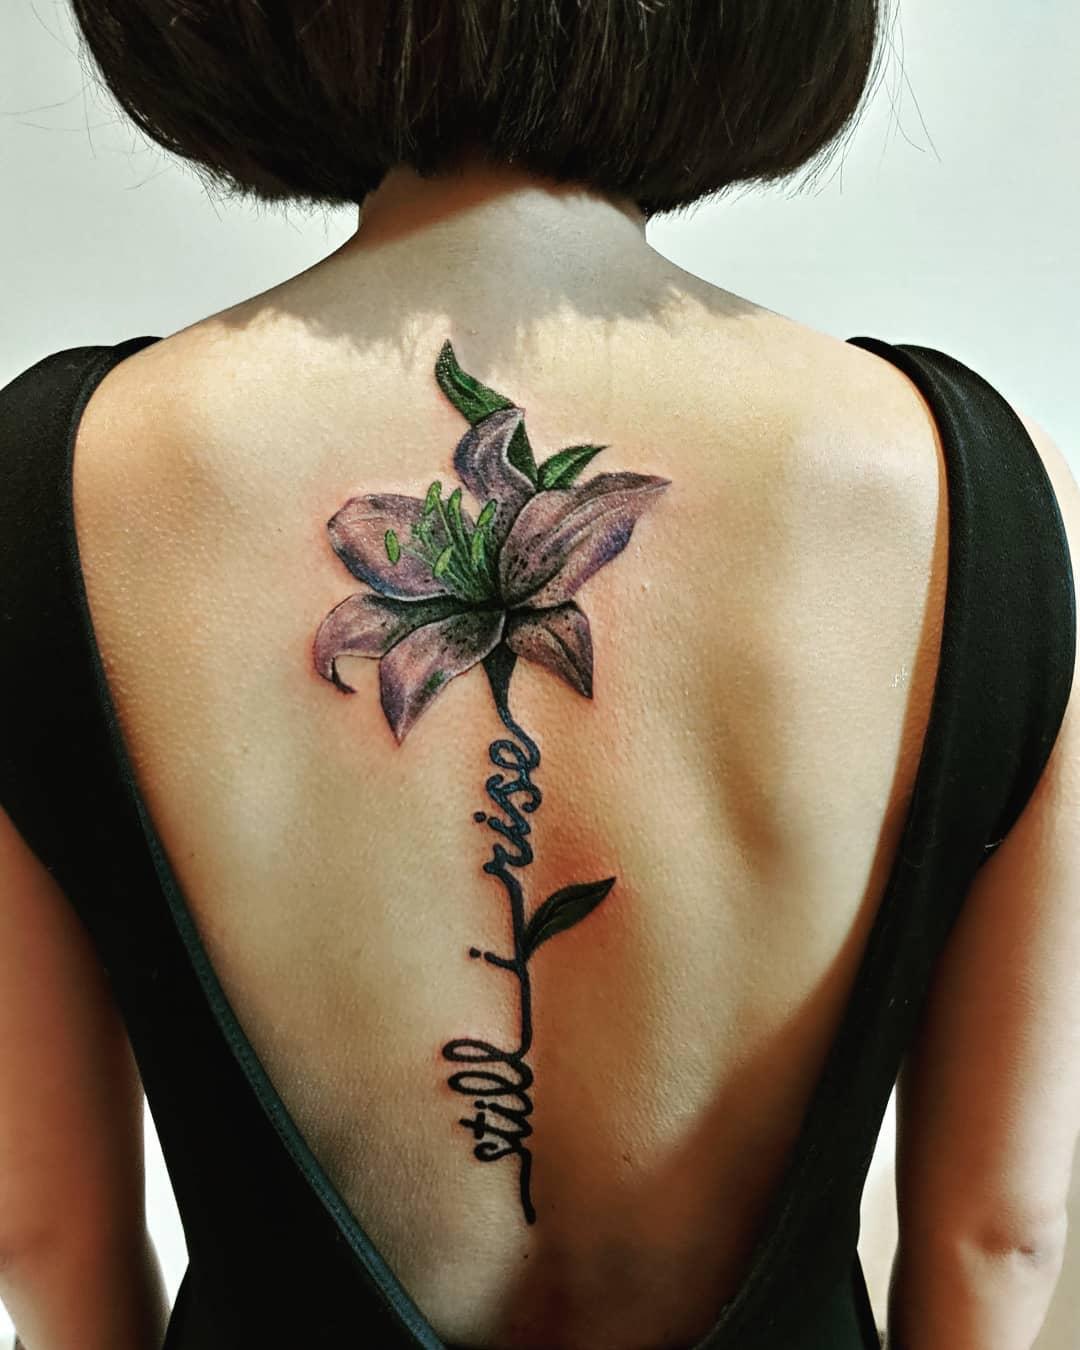 Back Still I Rise Tattoo -katie_ho2402